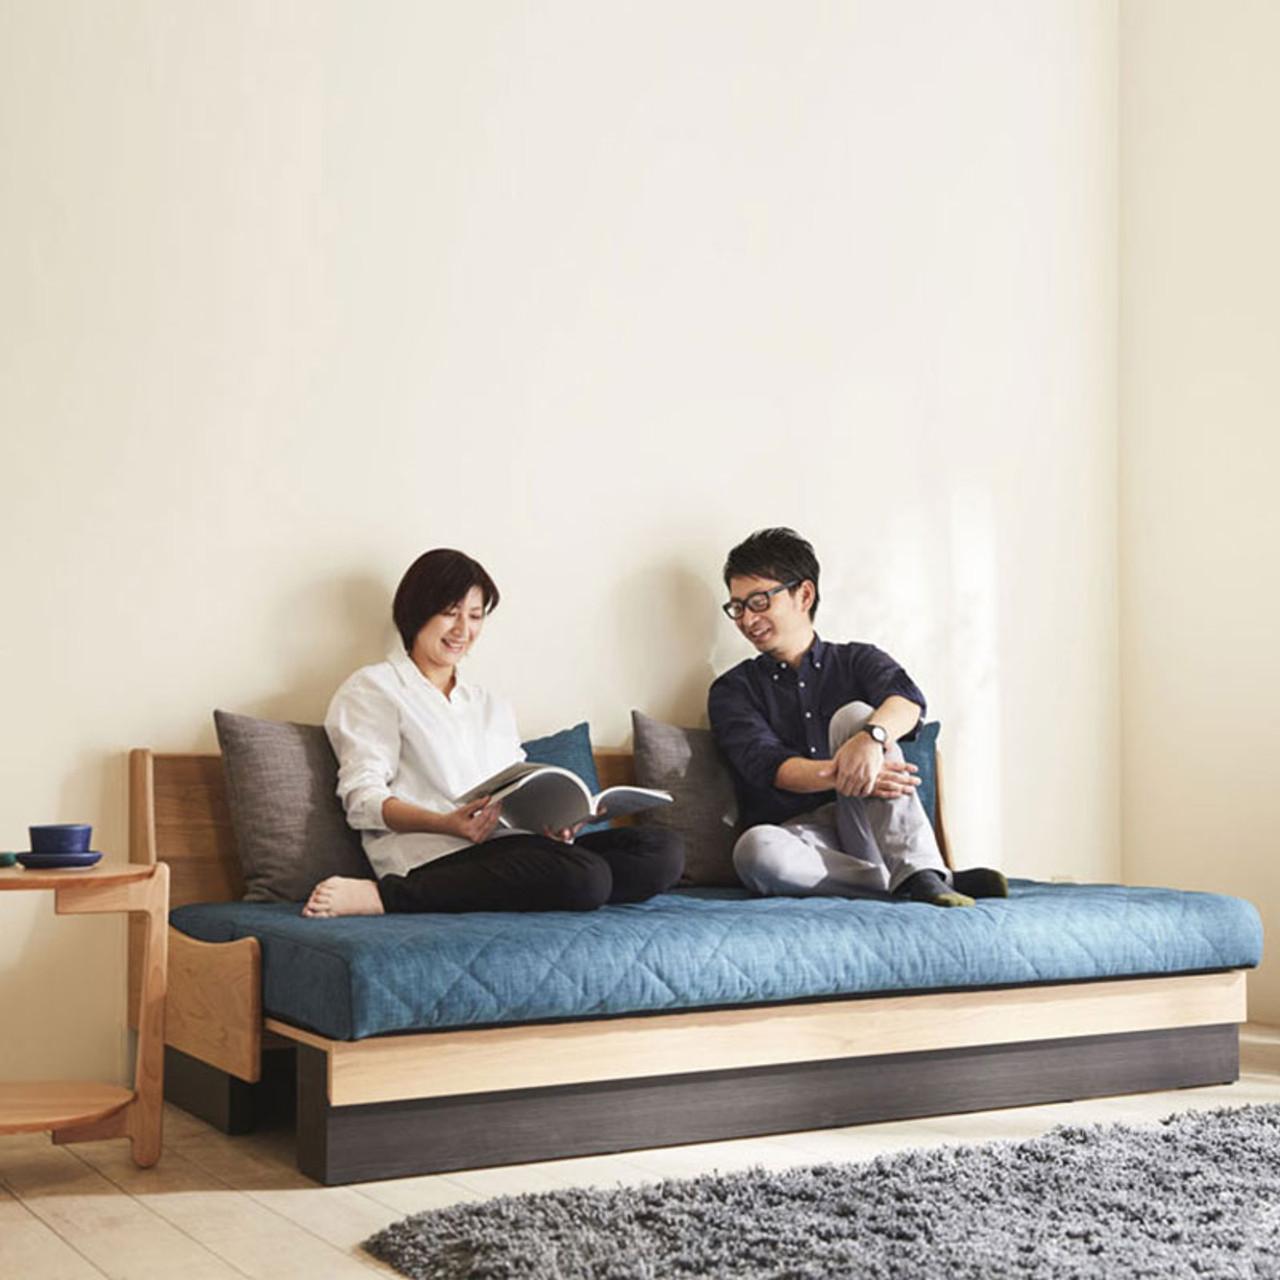 Meuble 200 Sofa Bed Hommage Lifestyle Pte Ltd